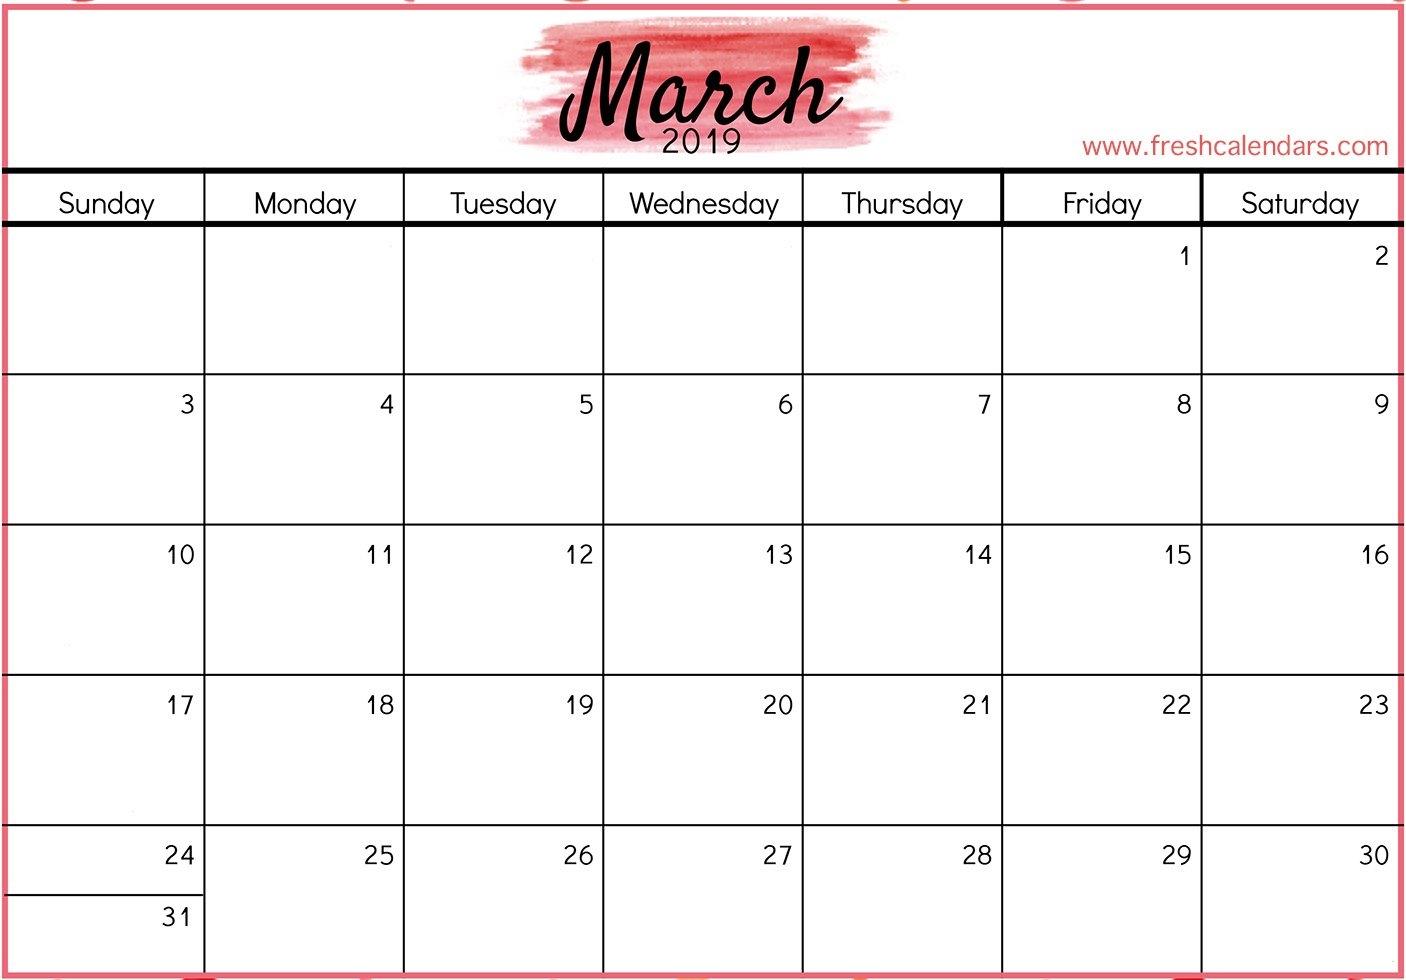 March 2019 Printable Calendars – Fresh Calendars A Calendar For March 2019